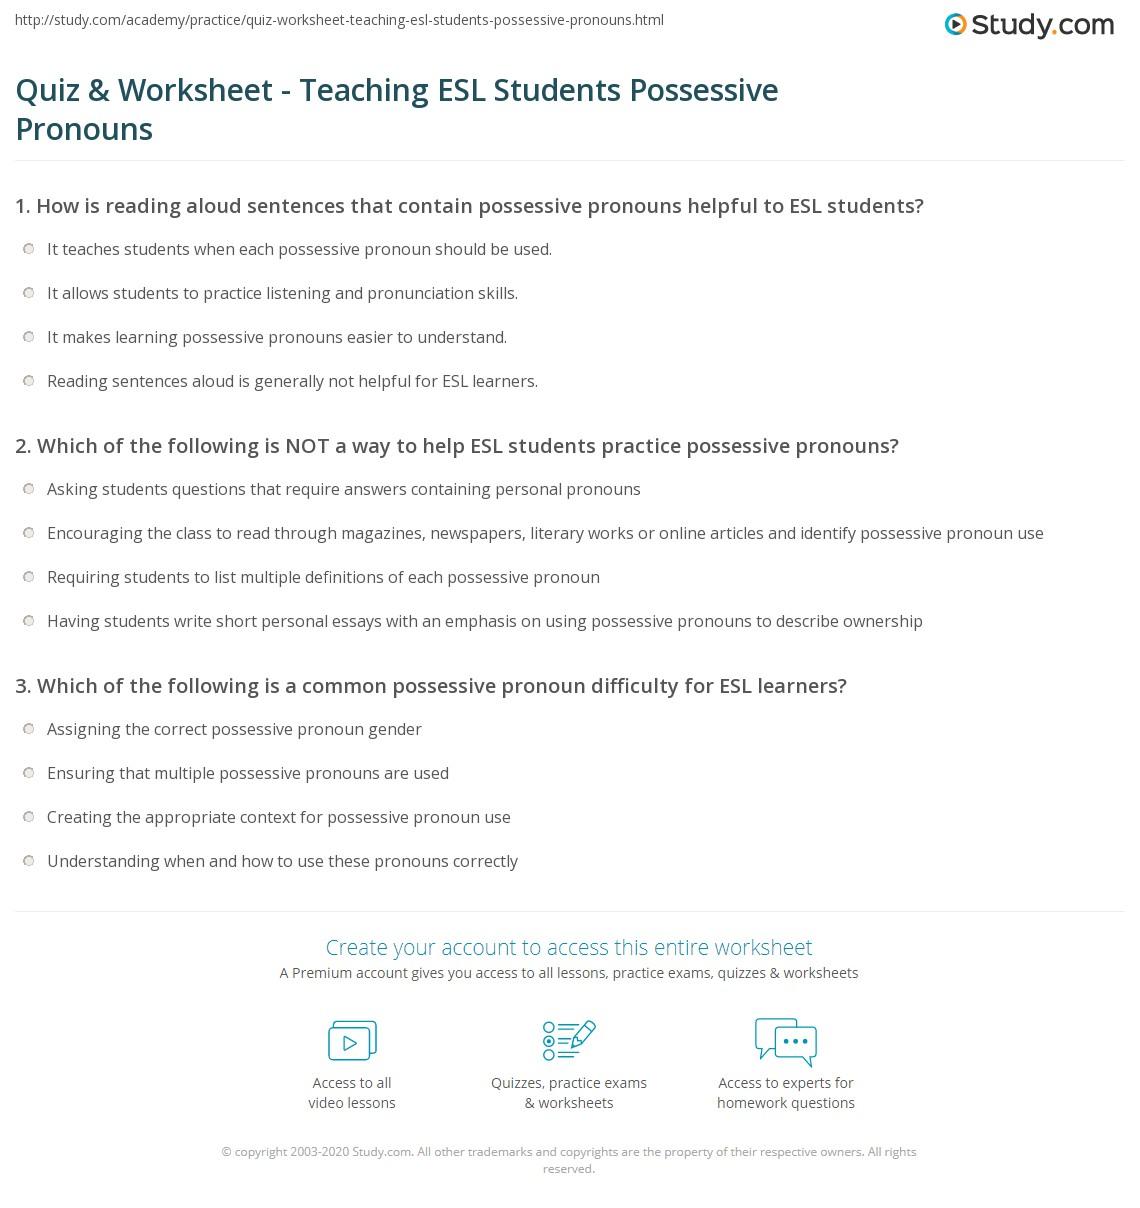 Quiz W Ksheet Te Ch G Esl Students Possessive Pr Ouns